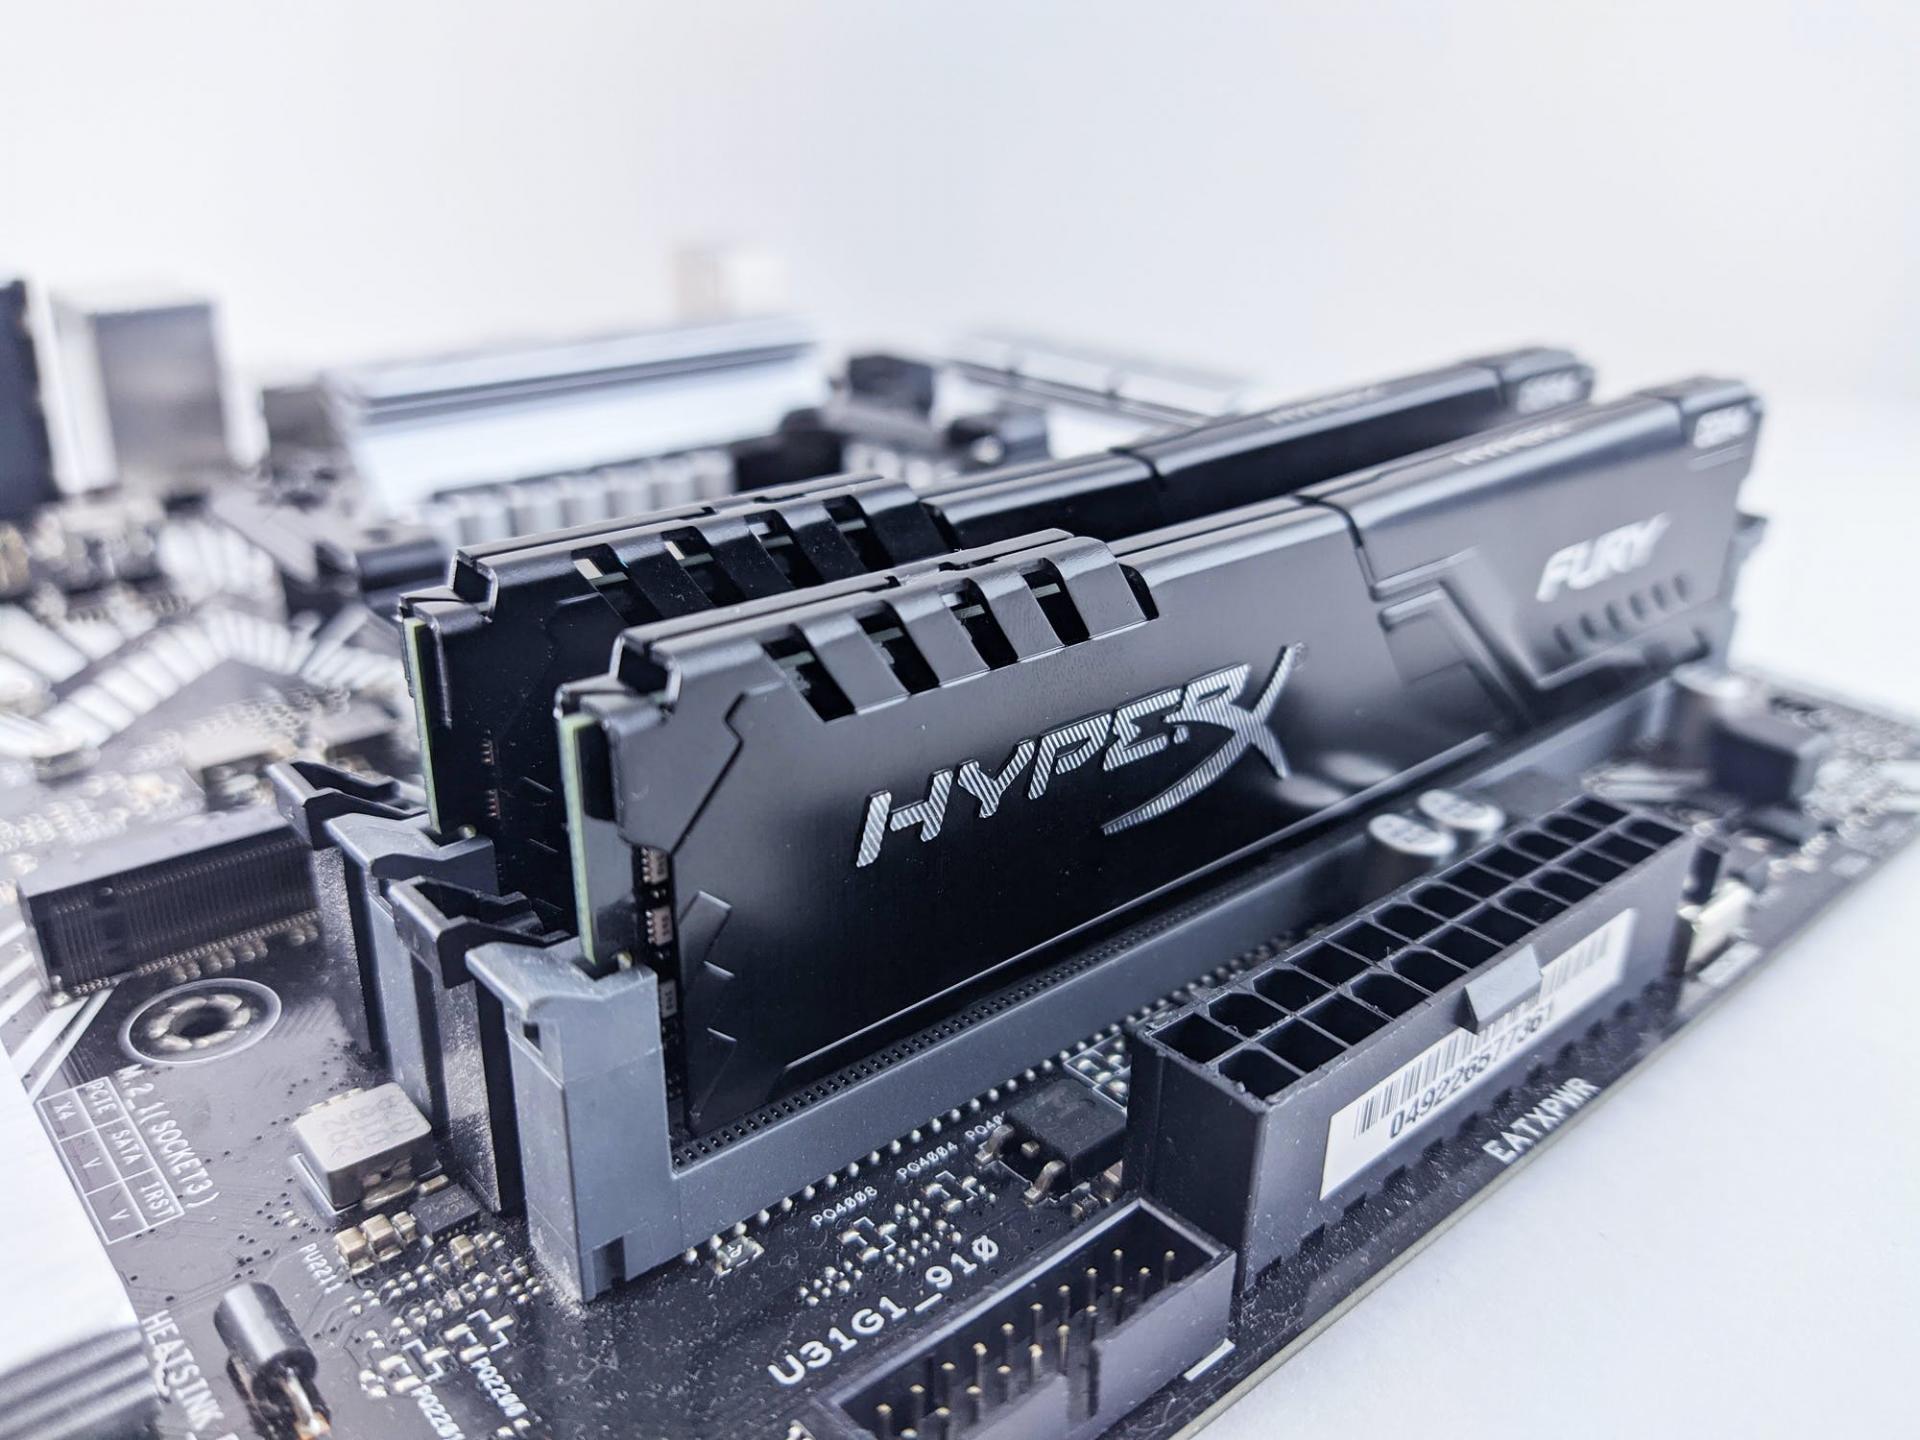 Названа самая быстрая память стандарта DDR4 для AMD и Intel